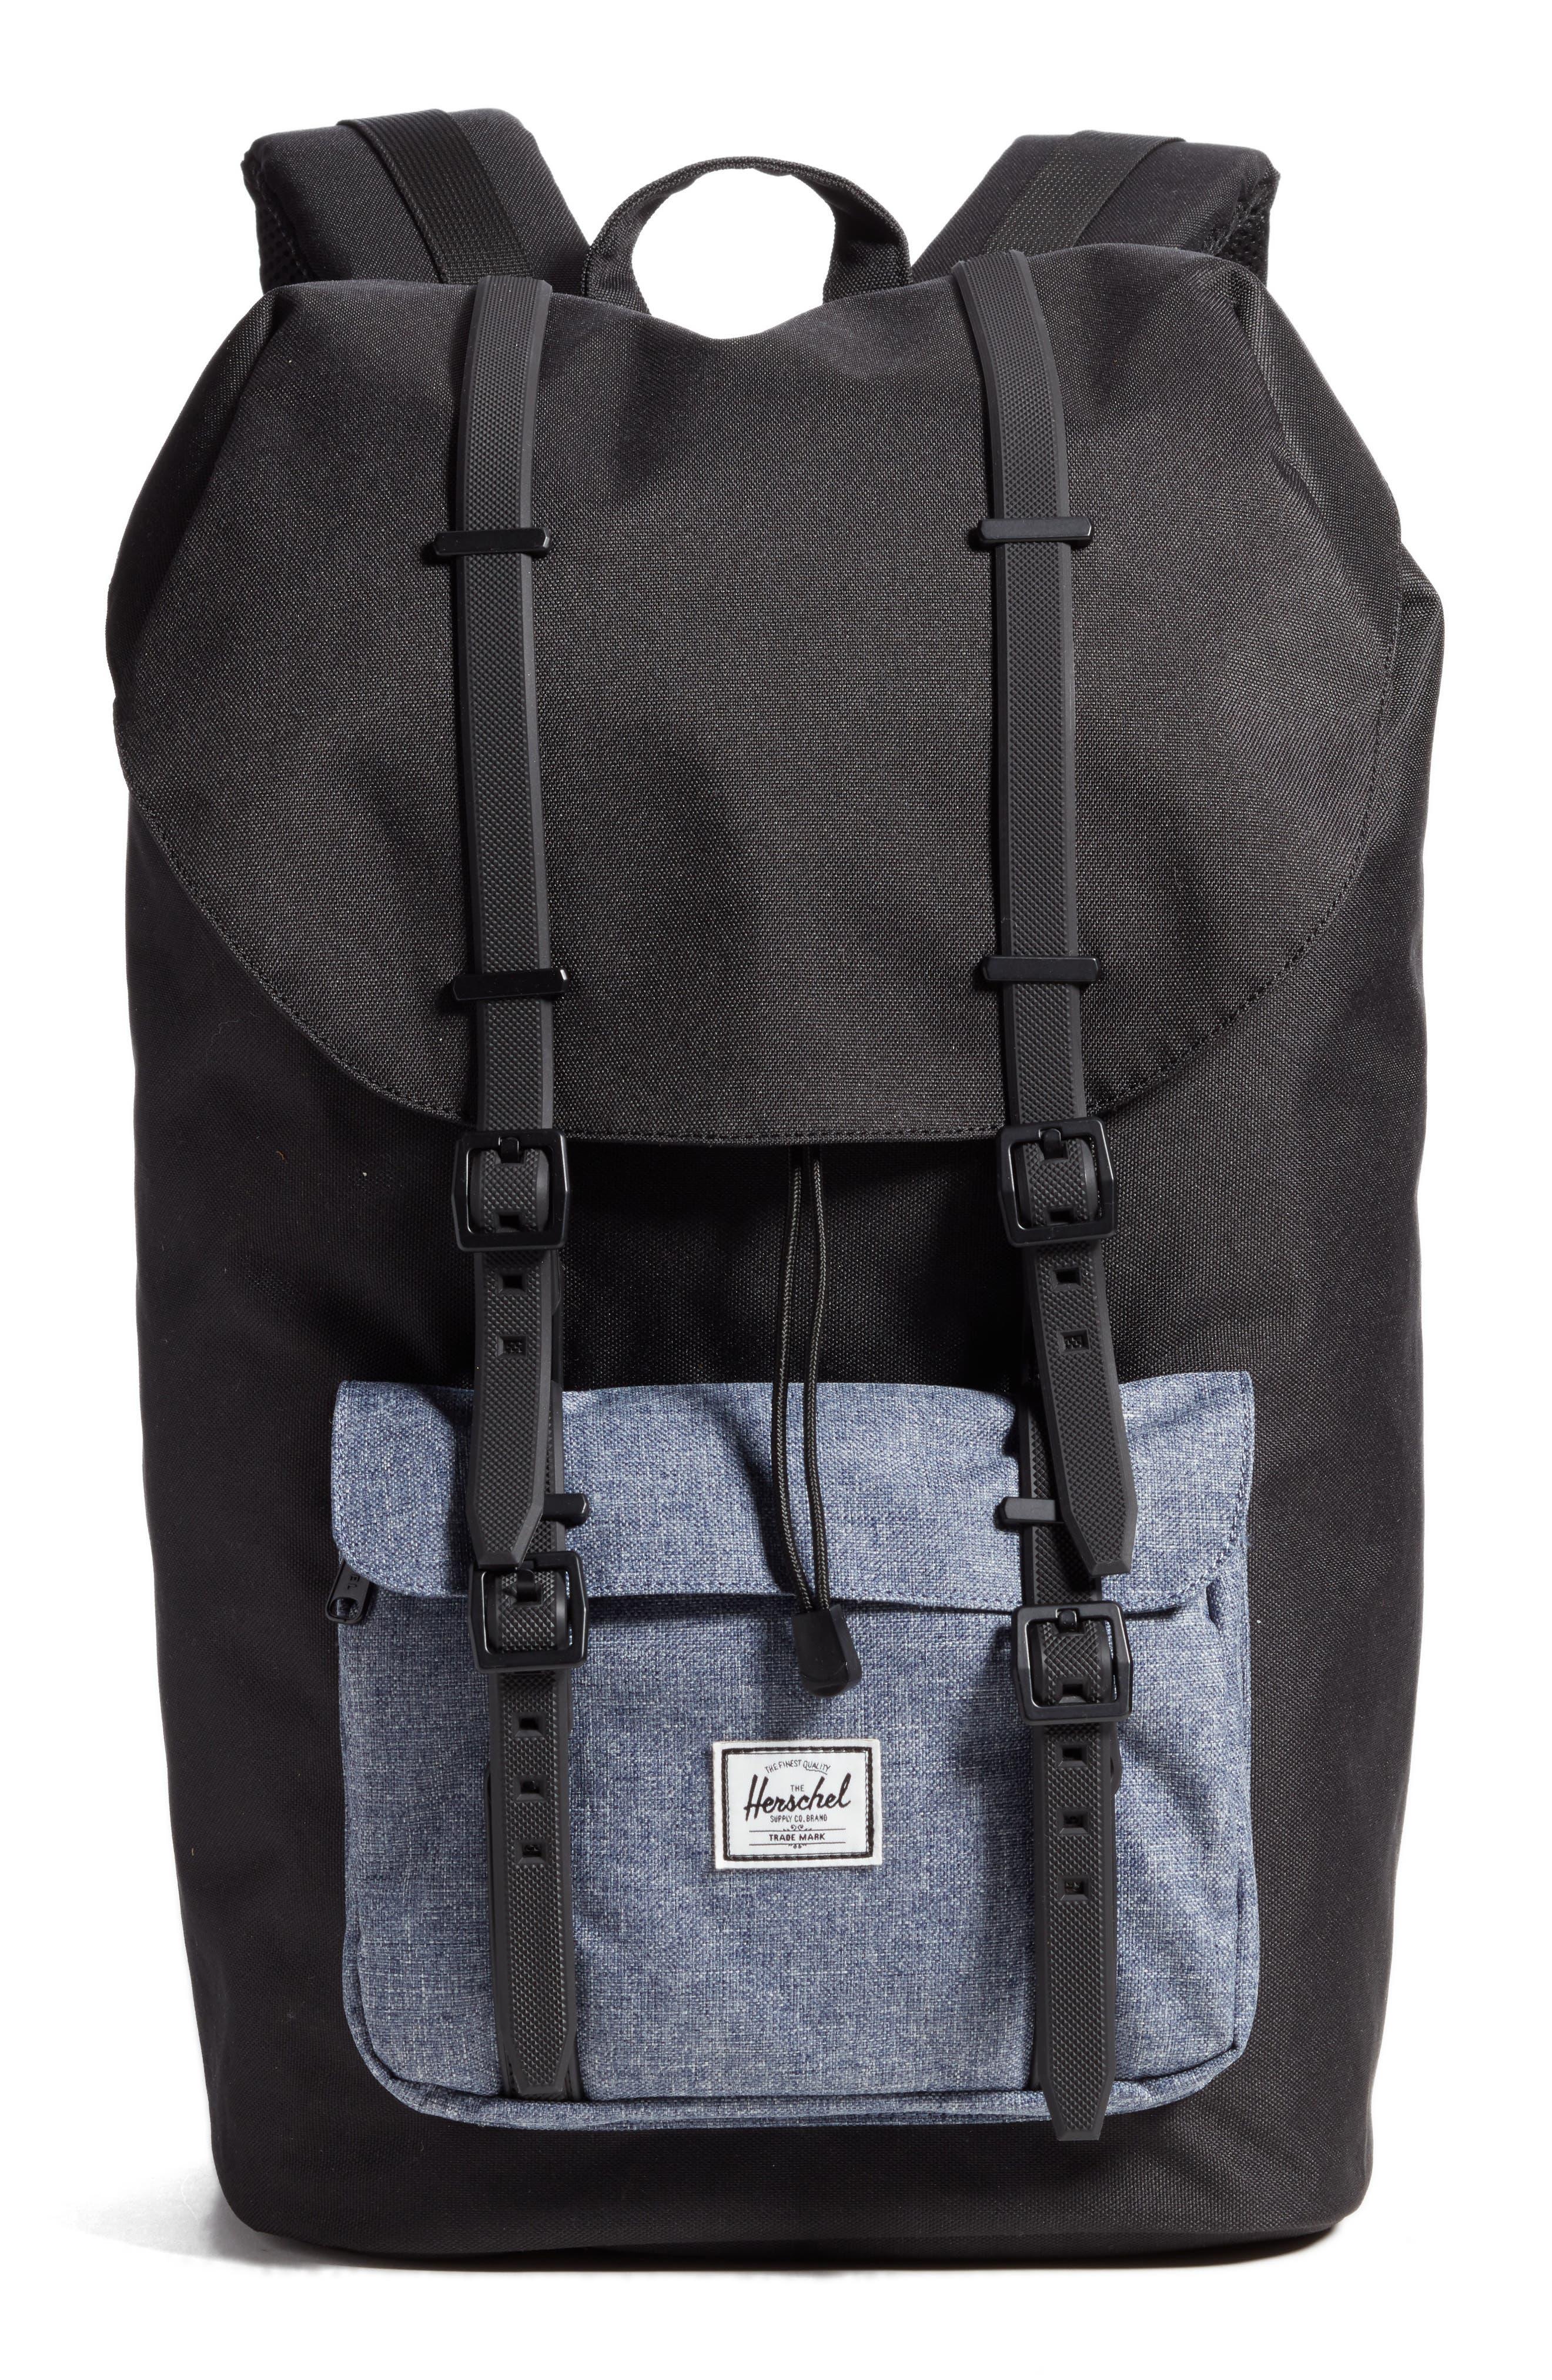 Little America - Chambray Backpack,                             Main thumbnail 1, color,                             Black/ Dark Chambray